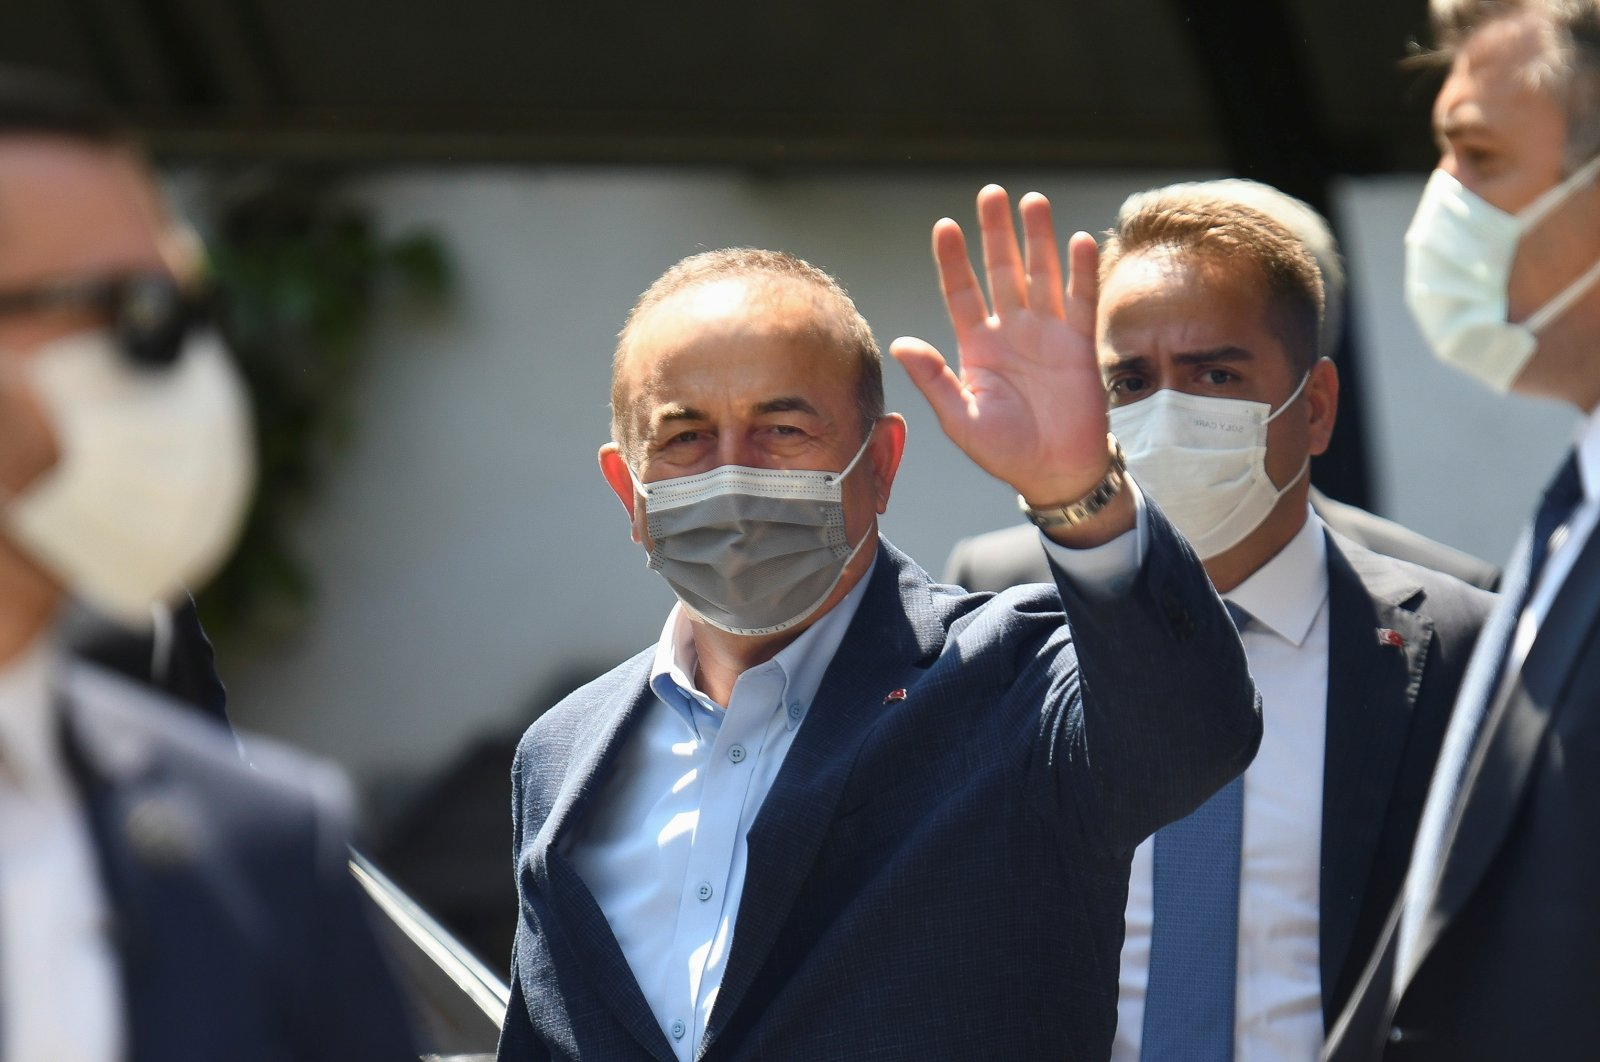 Turkish Foreign Minister Mevlüt Çavuşoğlu gestures during his visit at the Turkish Consulate in Komotini (Gümülcine), Greece, May 30, 2021. (REUTERS Photo)